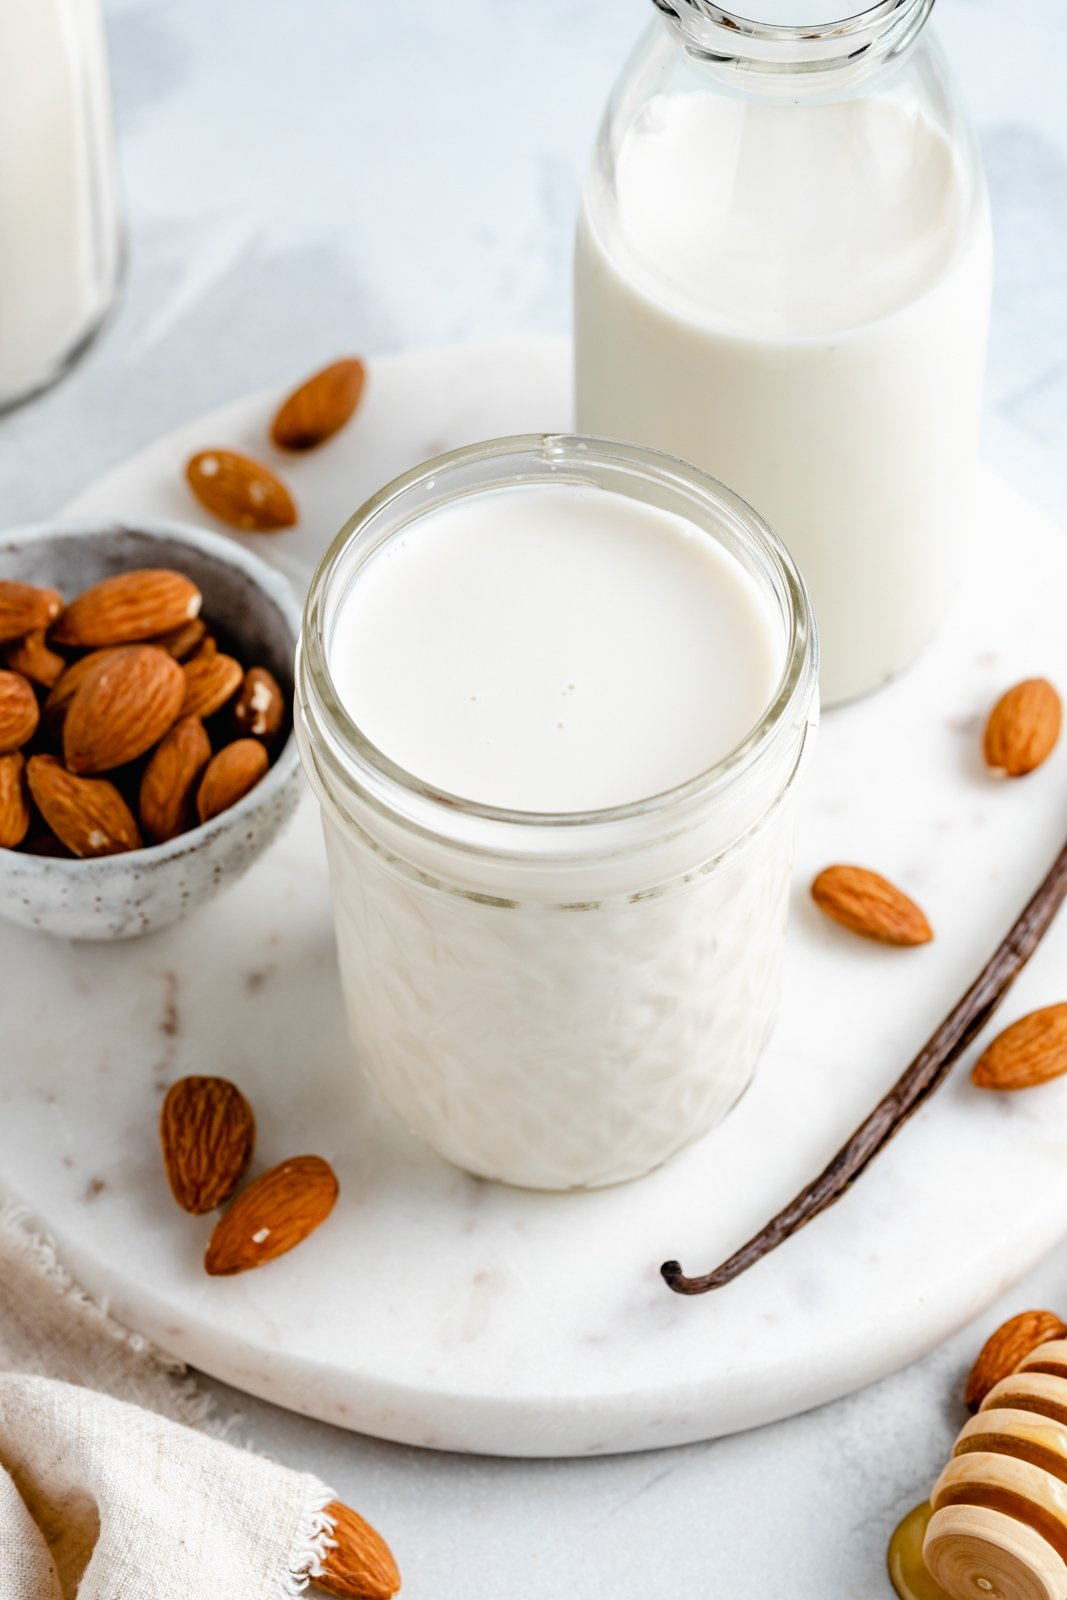 homemade almond milk in jars